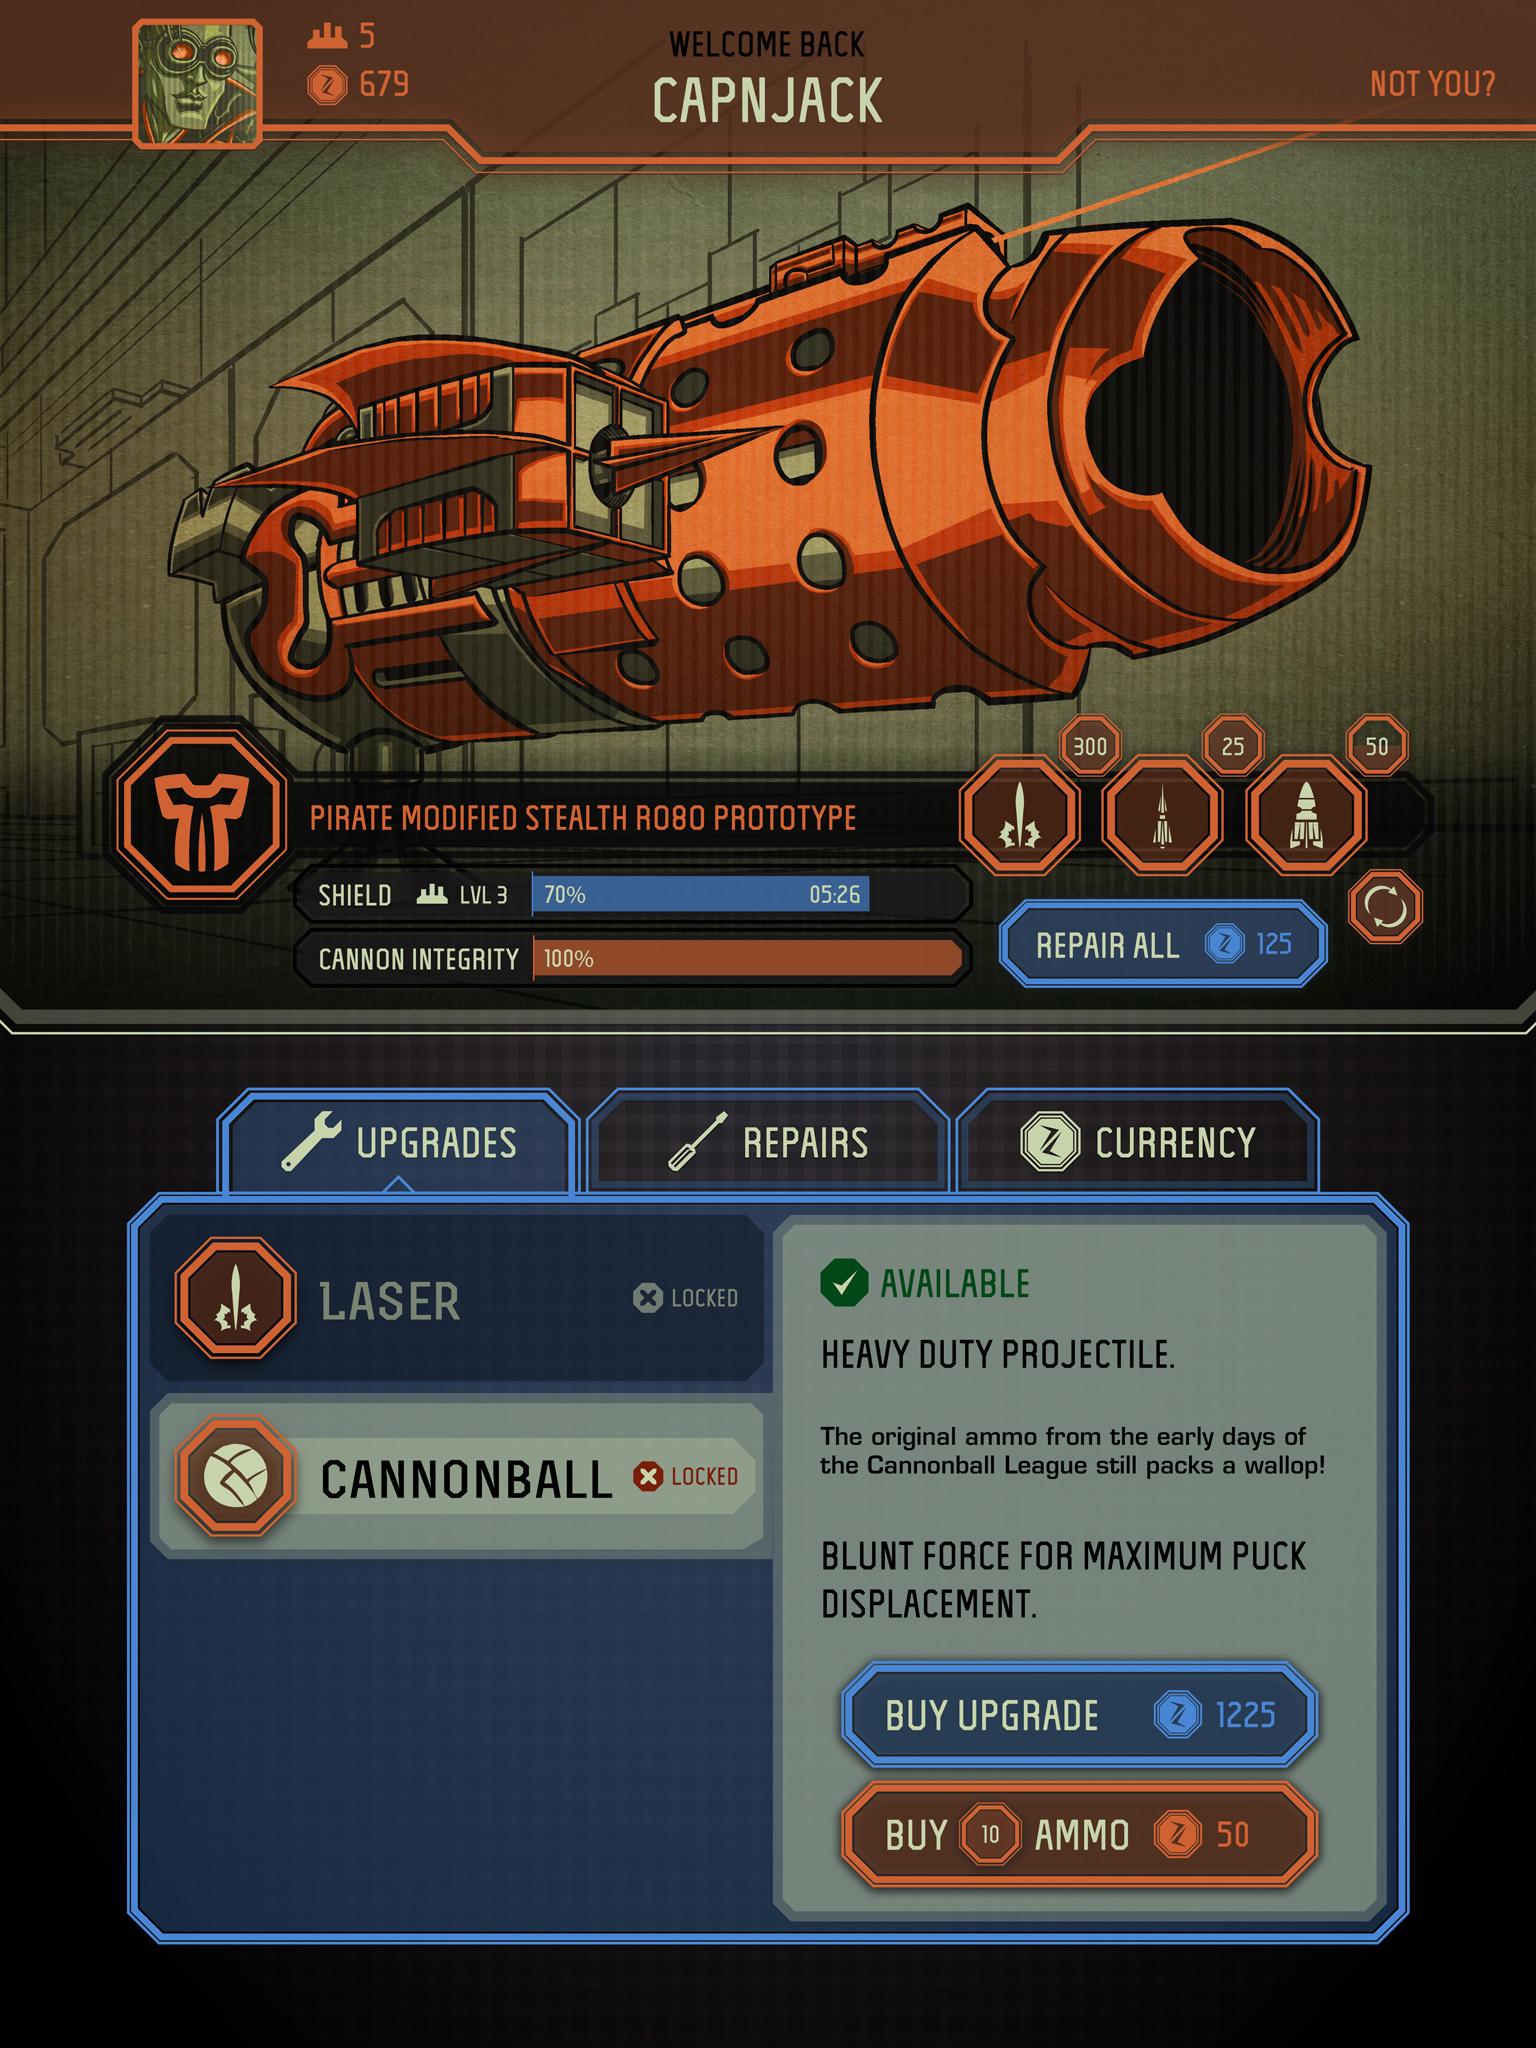 CannonPortrait_Pirate_FullUpgrade.jpg